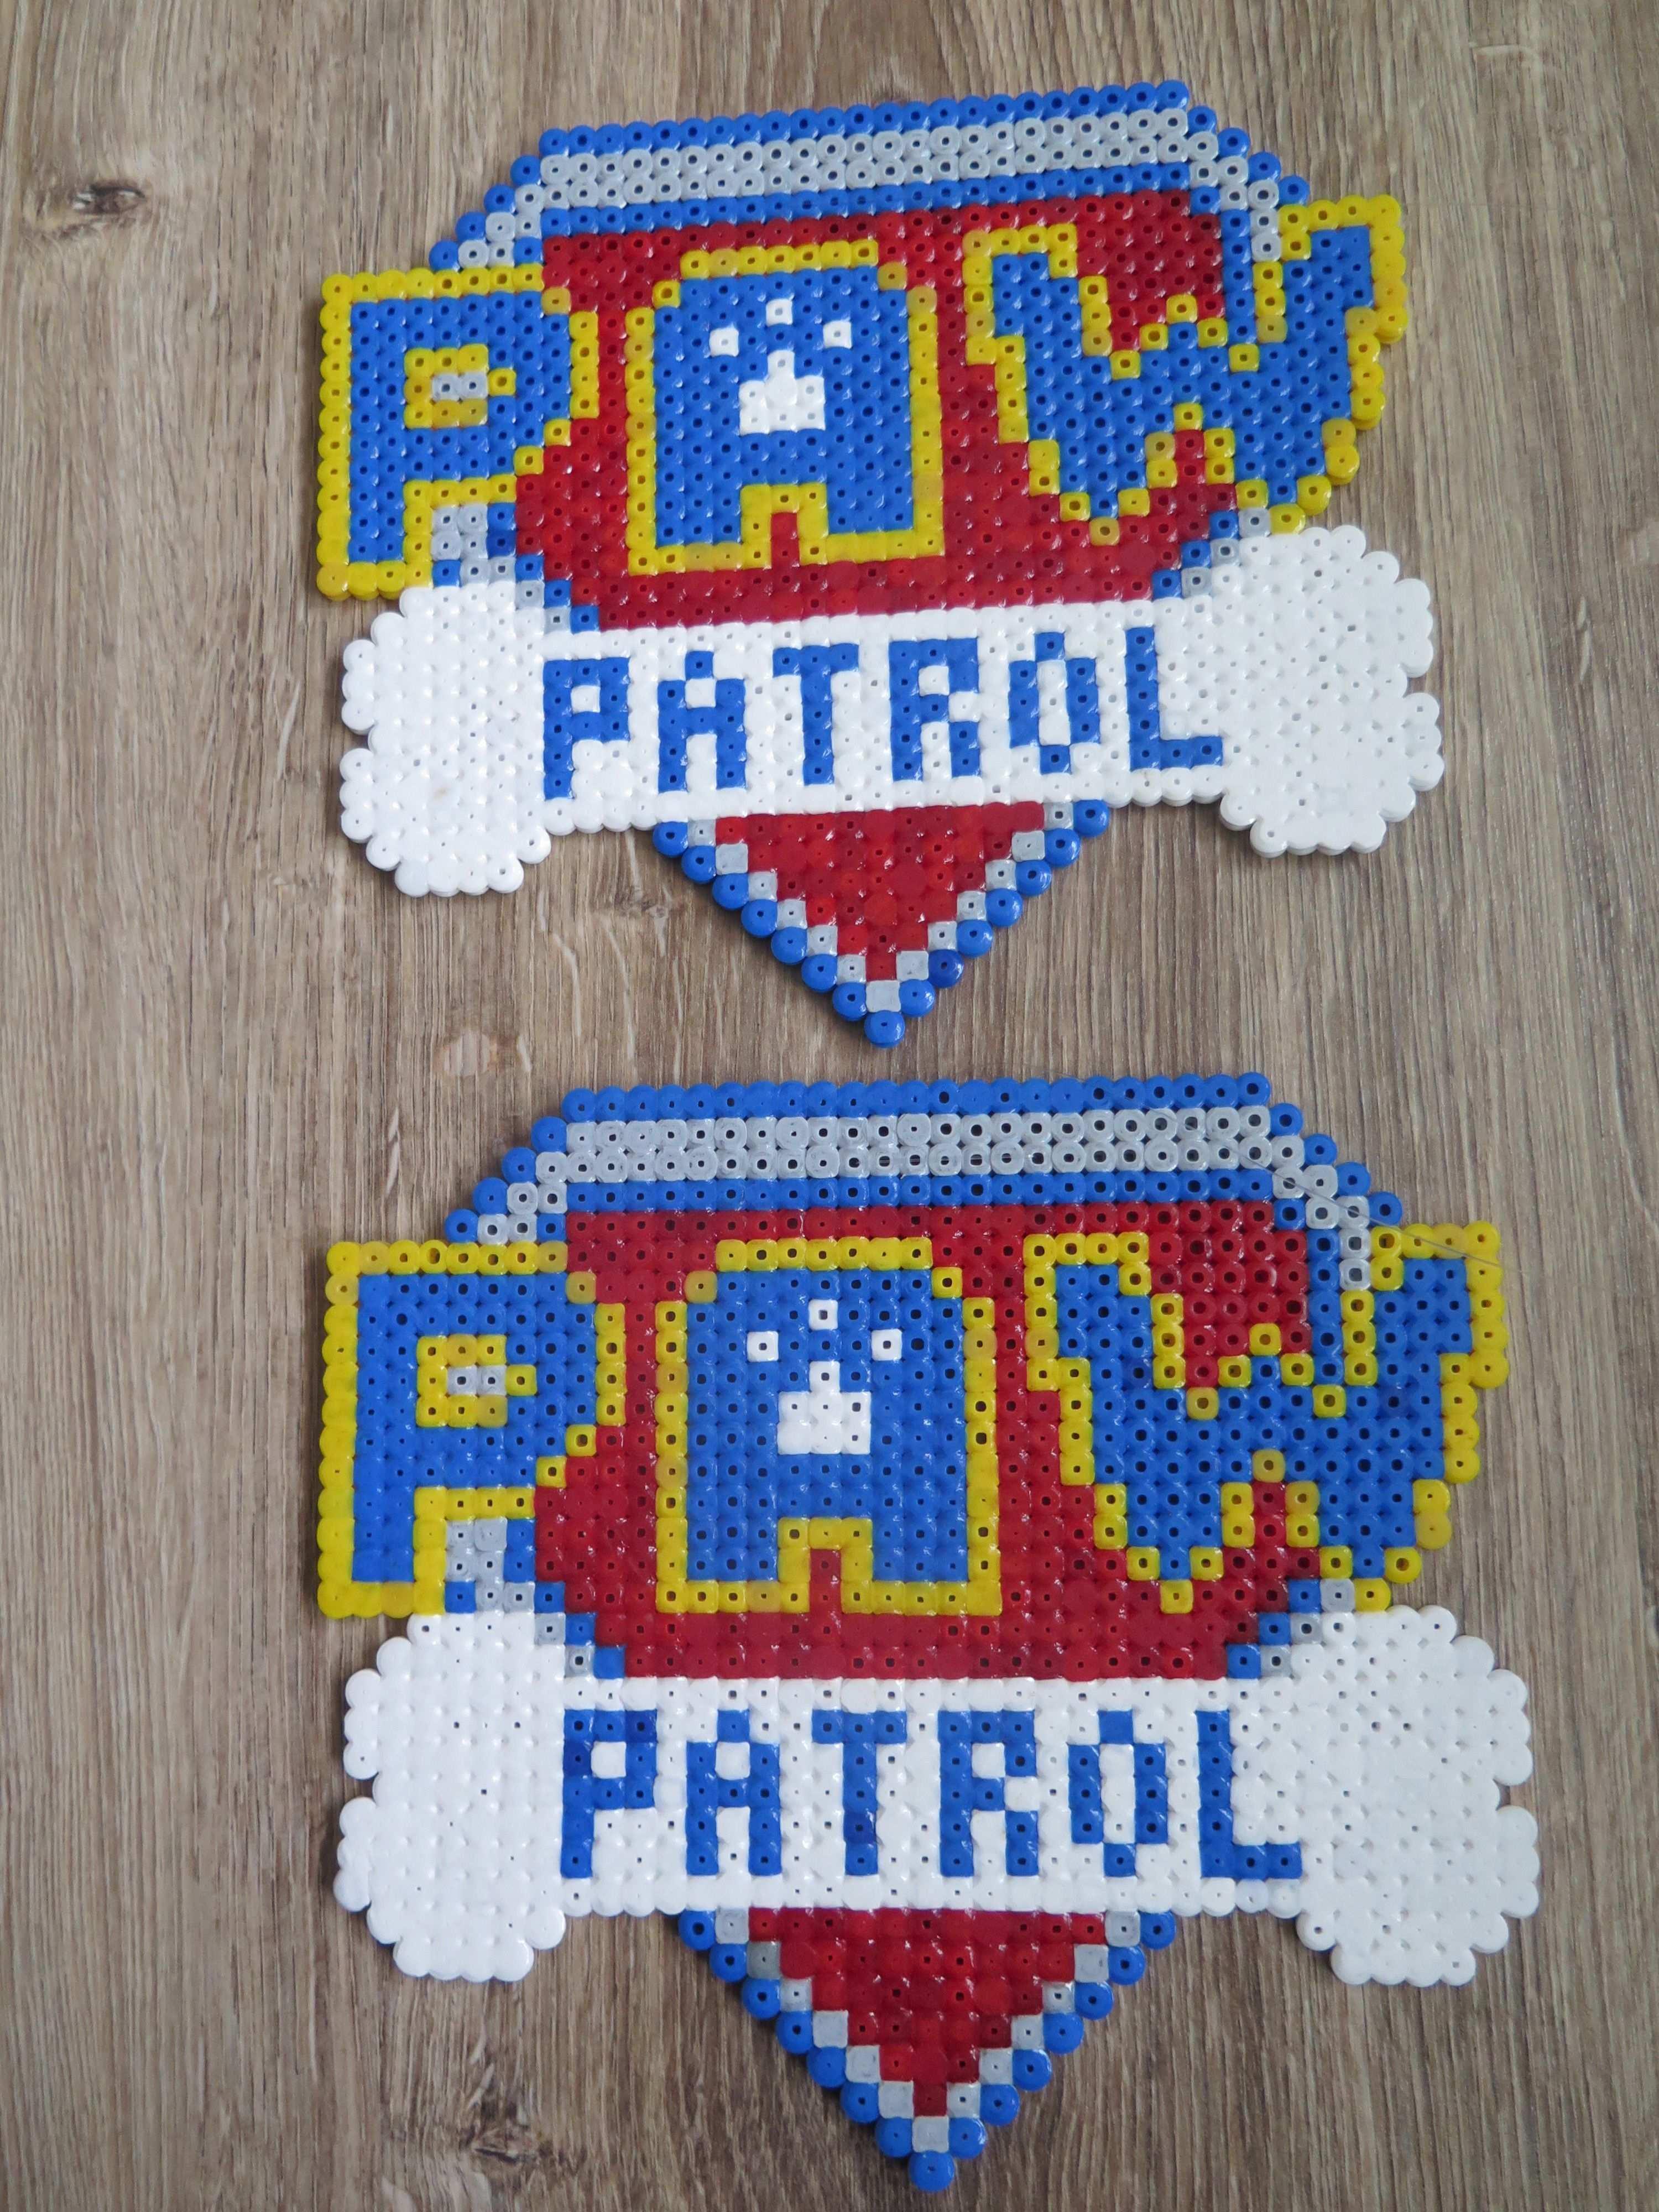 Paw Patrol Logo Hama Strijkkralen Beads Perler Bugelperlen Bugelperlen Vorlagen Basteln Bugelperlen